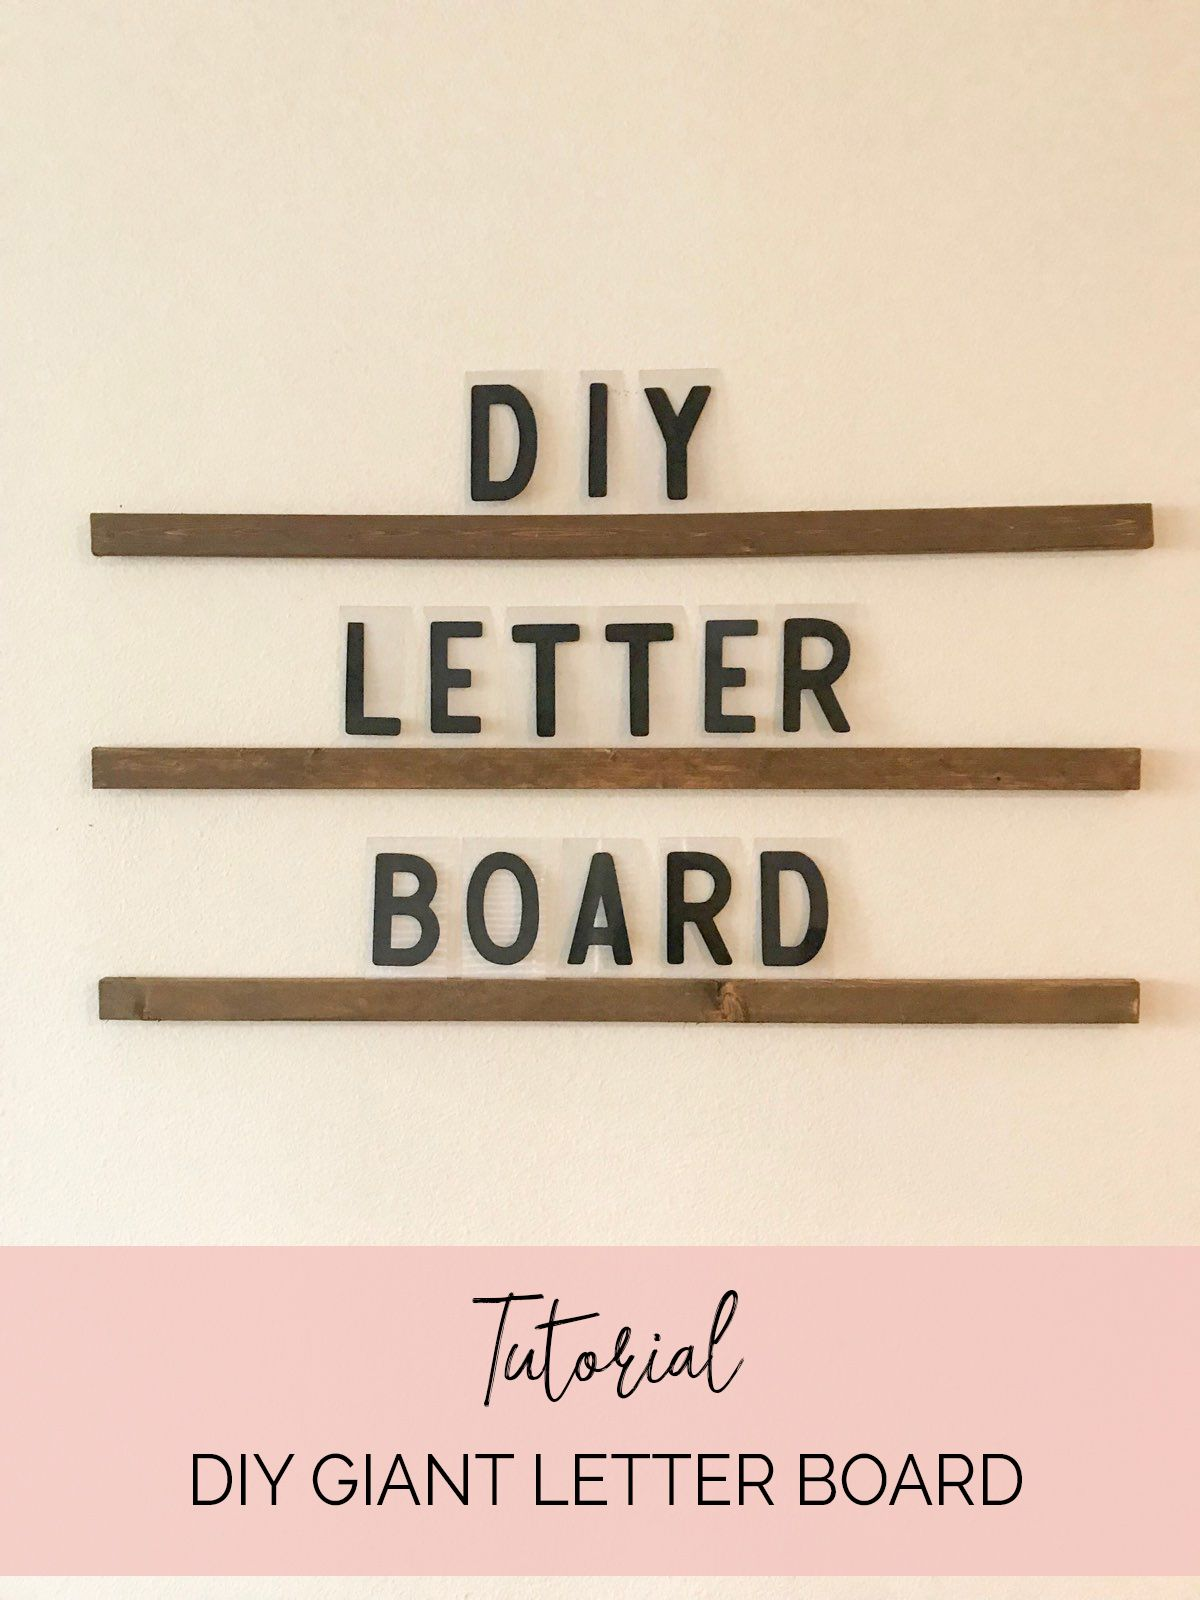 Diy Giant Letter Board